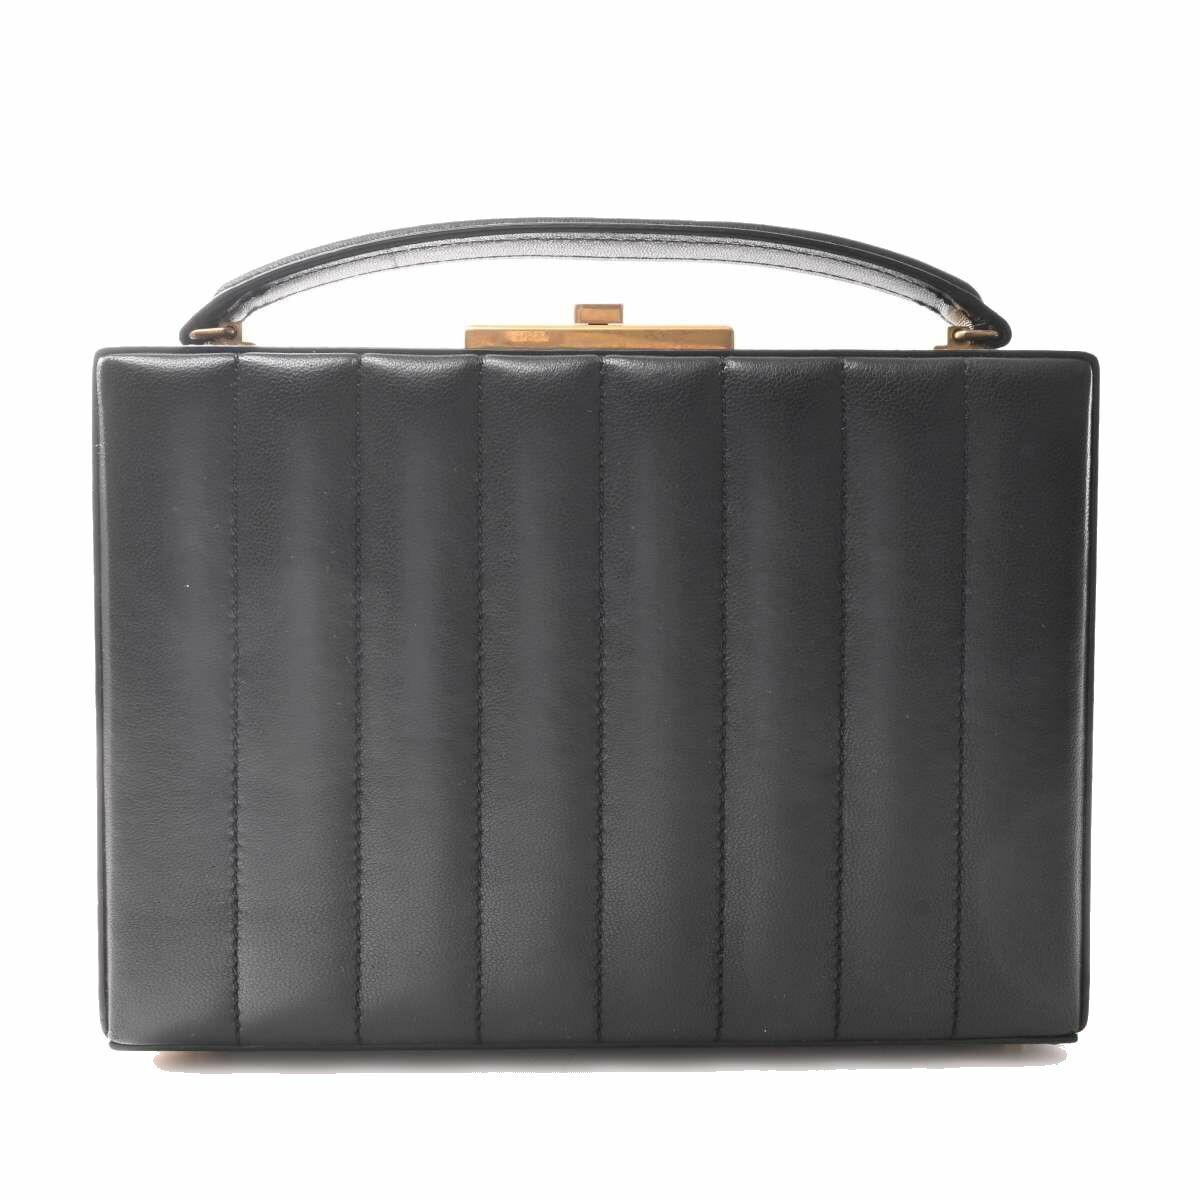 Saint Laurent Leather Mini Trunk Box 2WAY Handbag Black